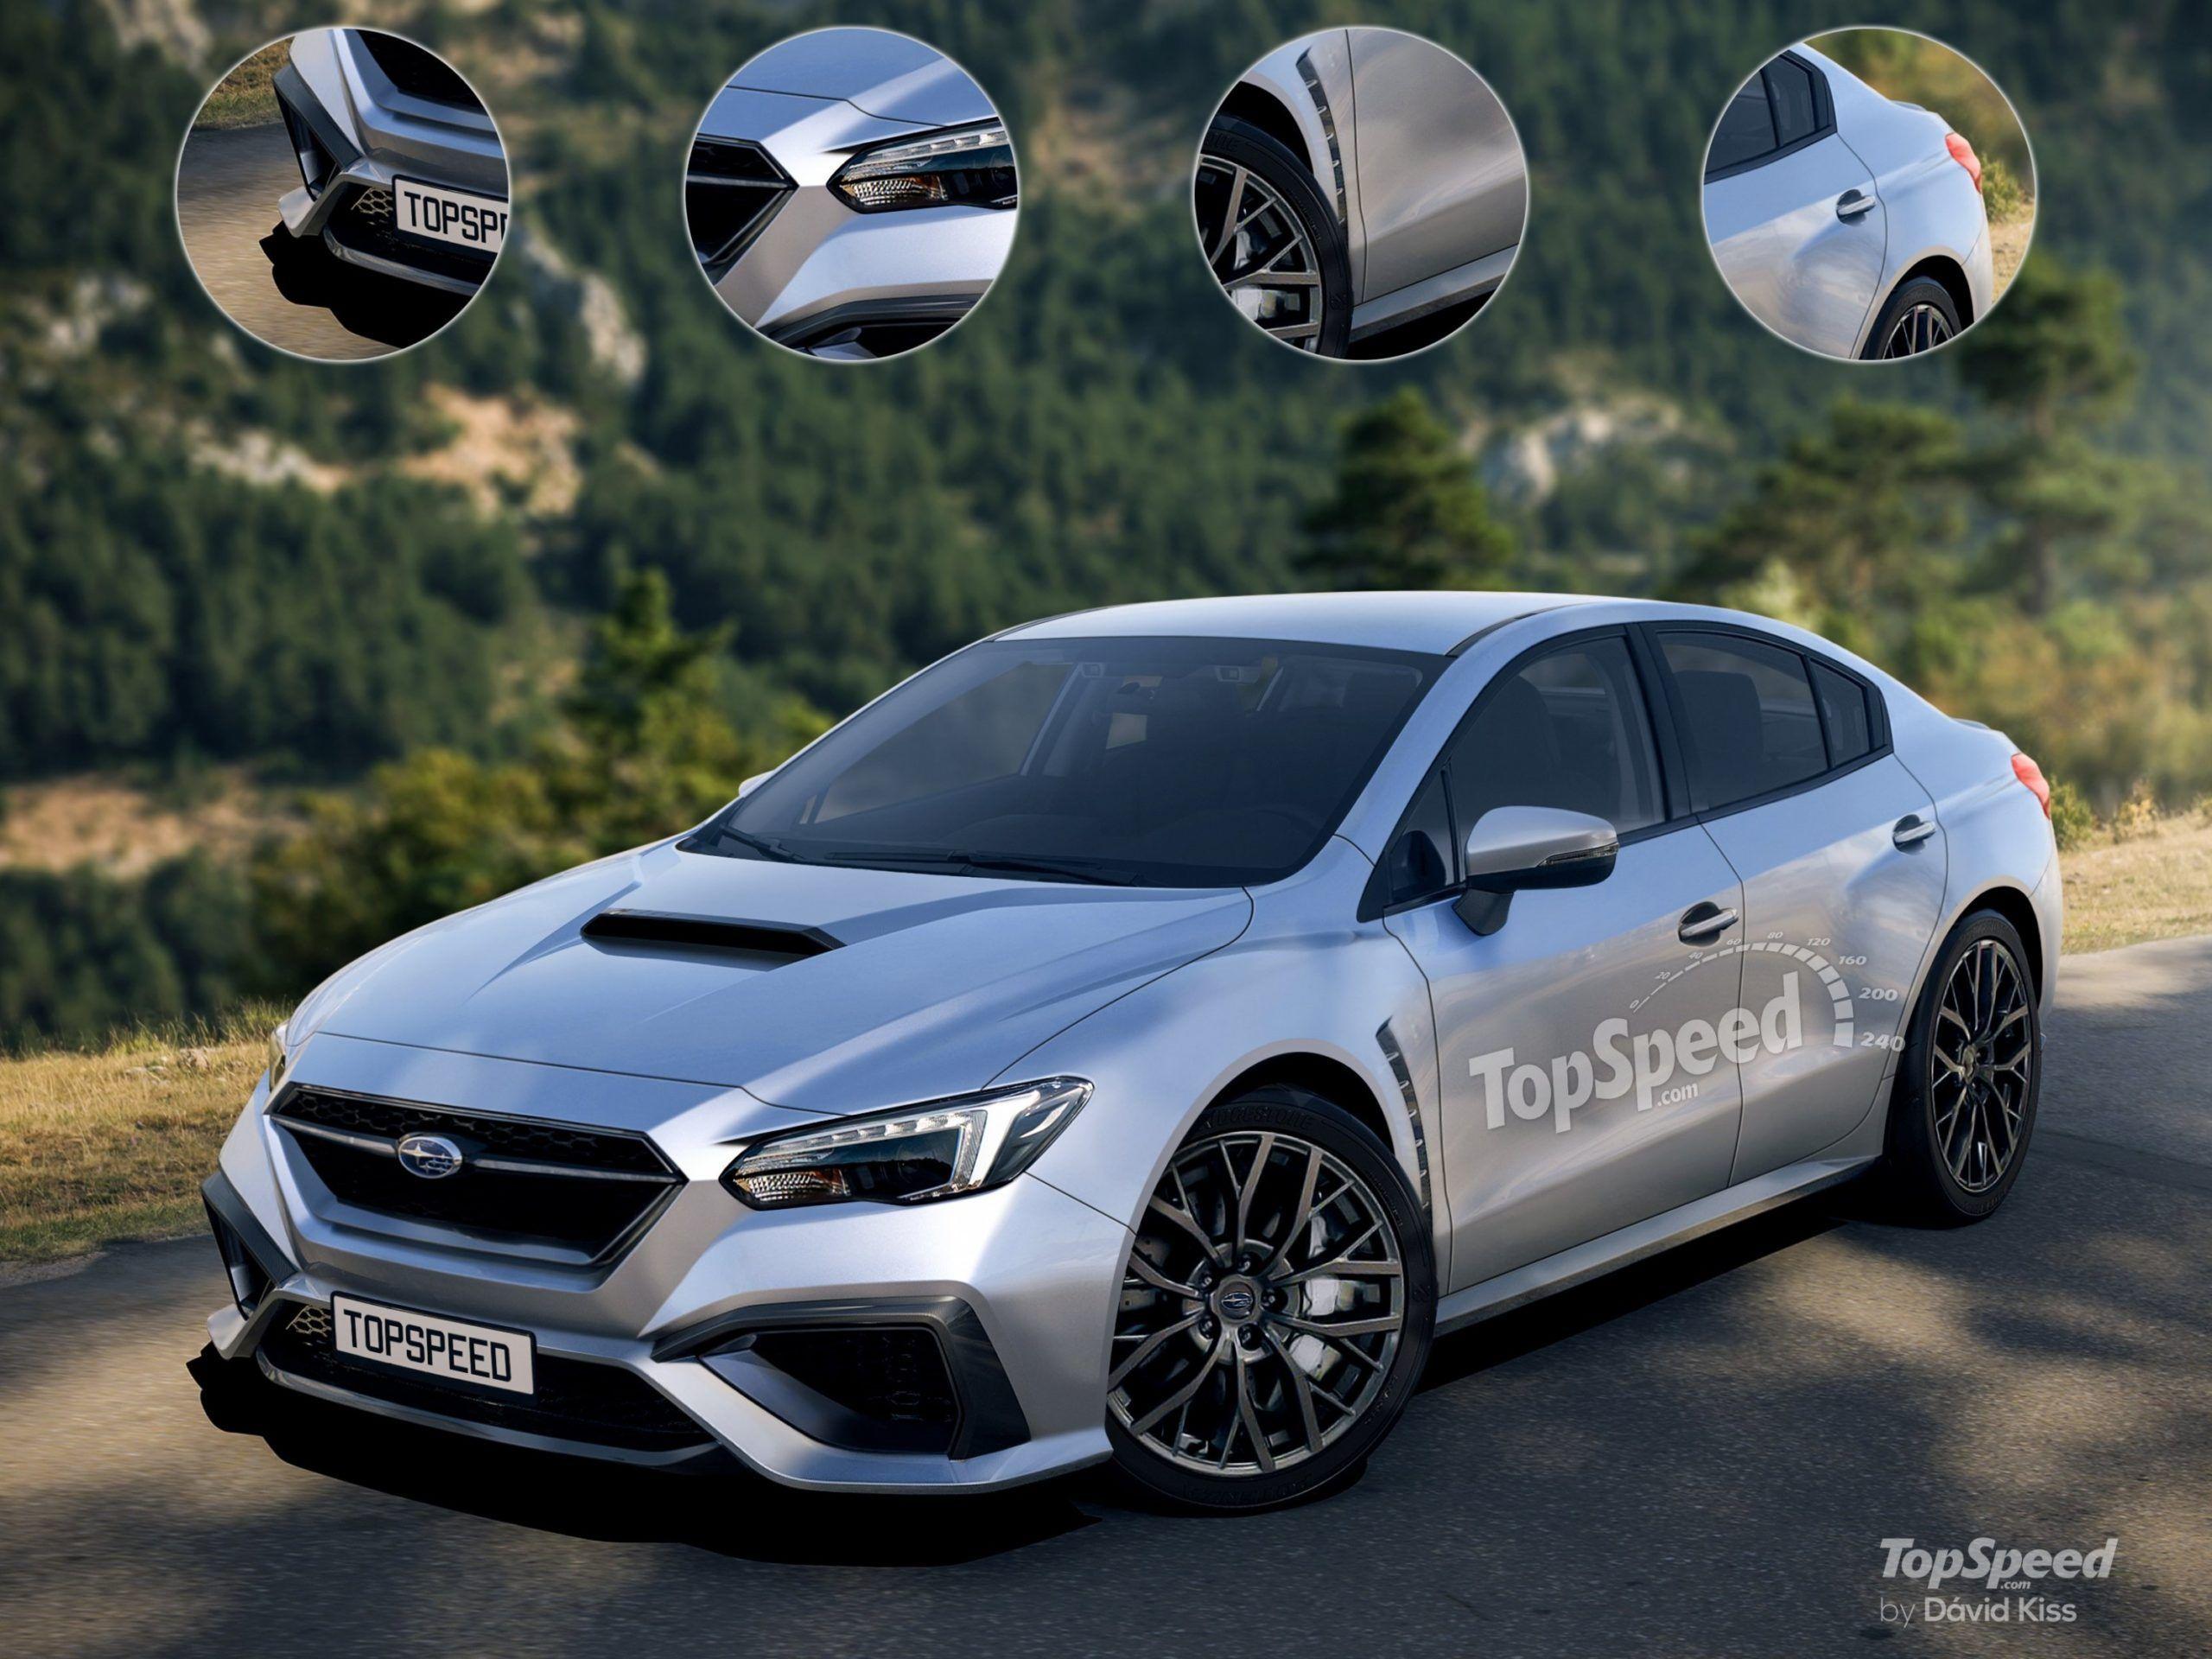 Subaru 2021 New Model Release Date And Concept In 2020 Subaru Wrx Subaru Legacy Subaru Impreza